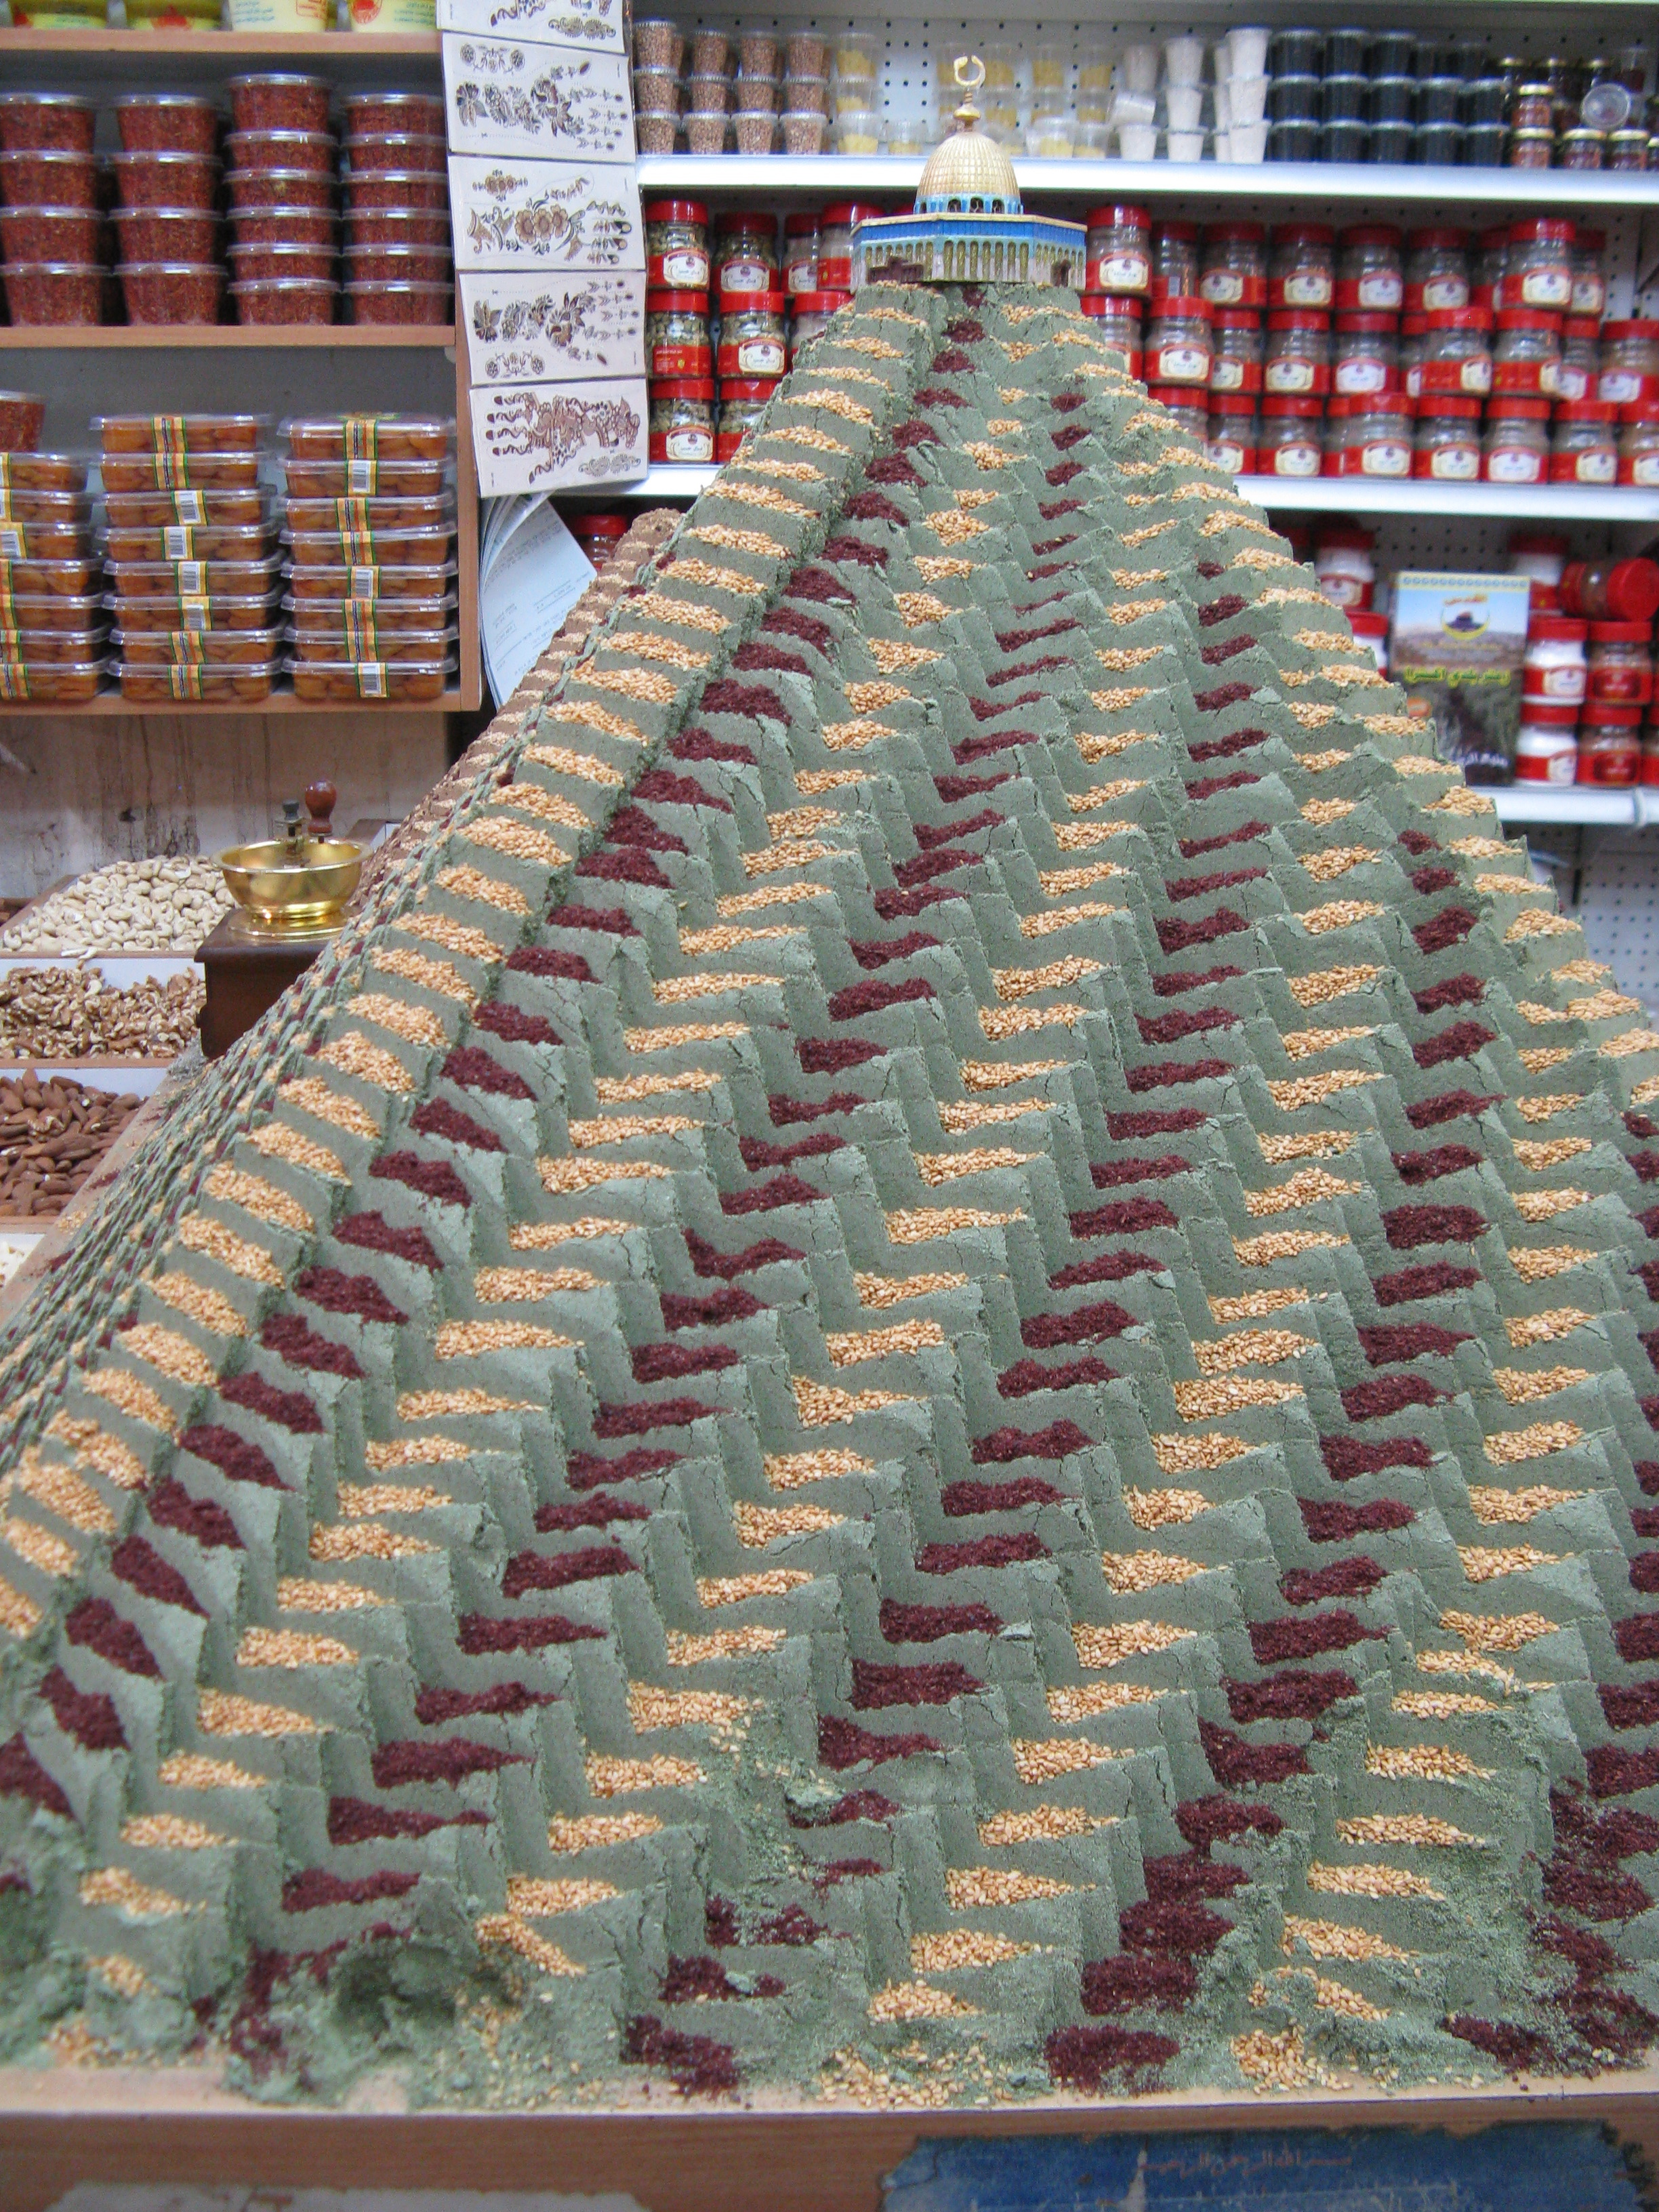 mountain of zaatar at spice vendor in bazaar